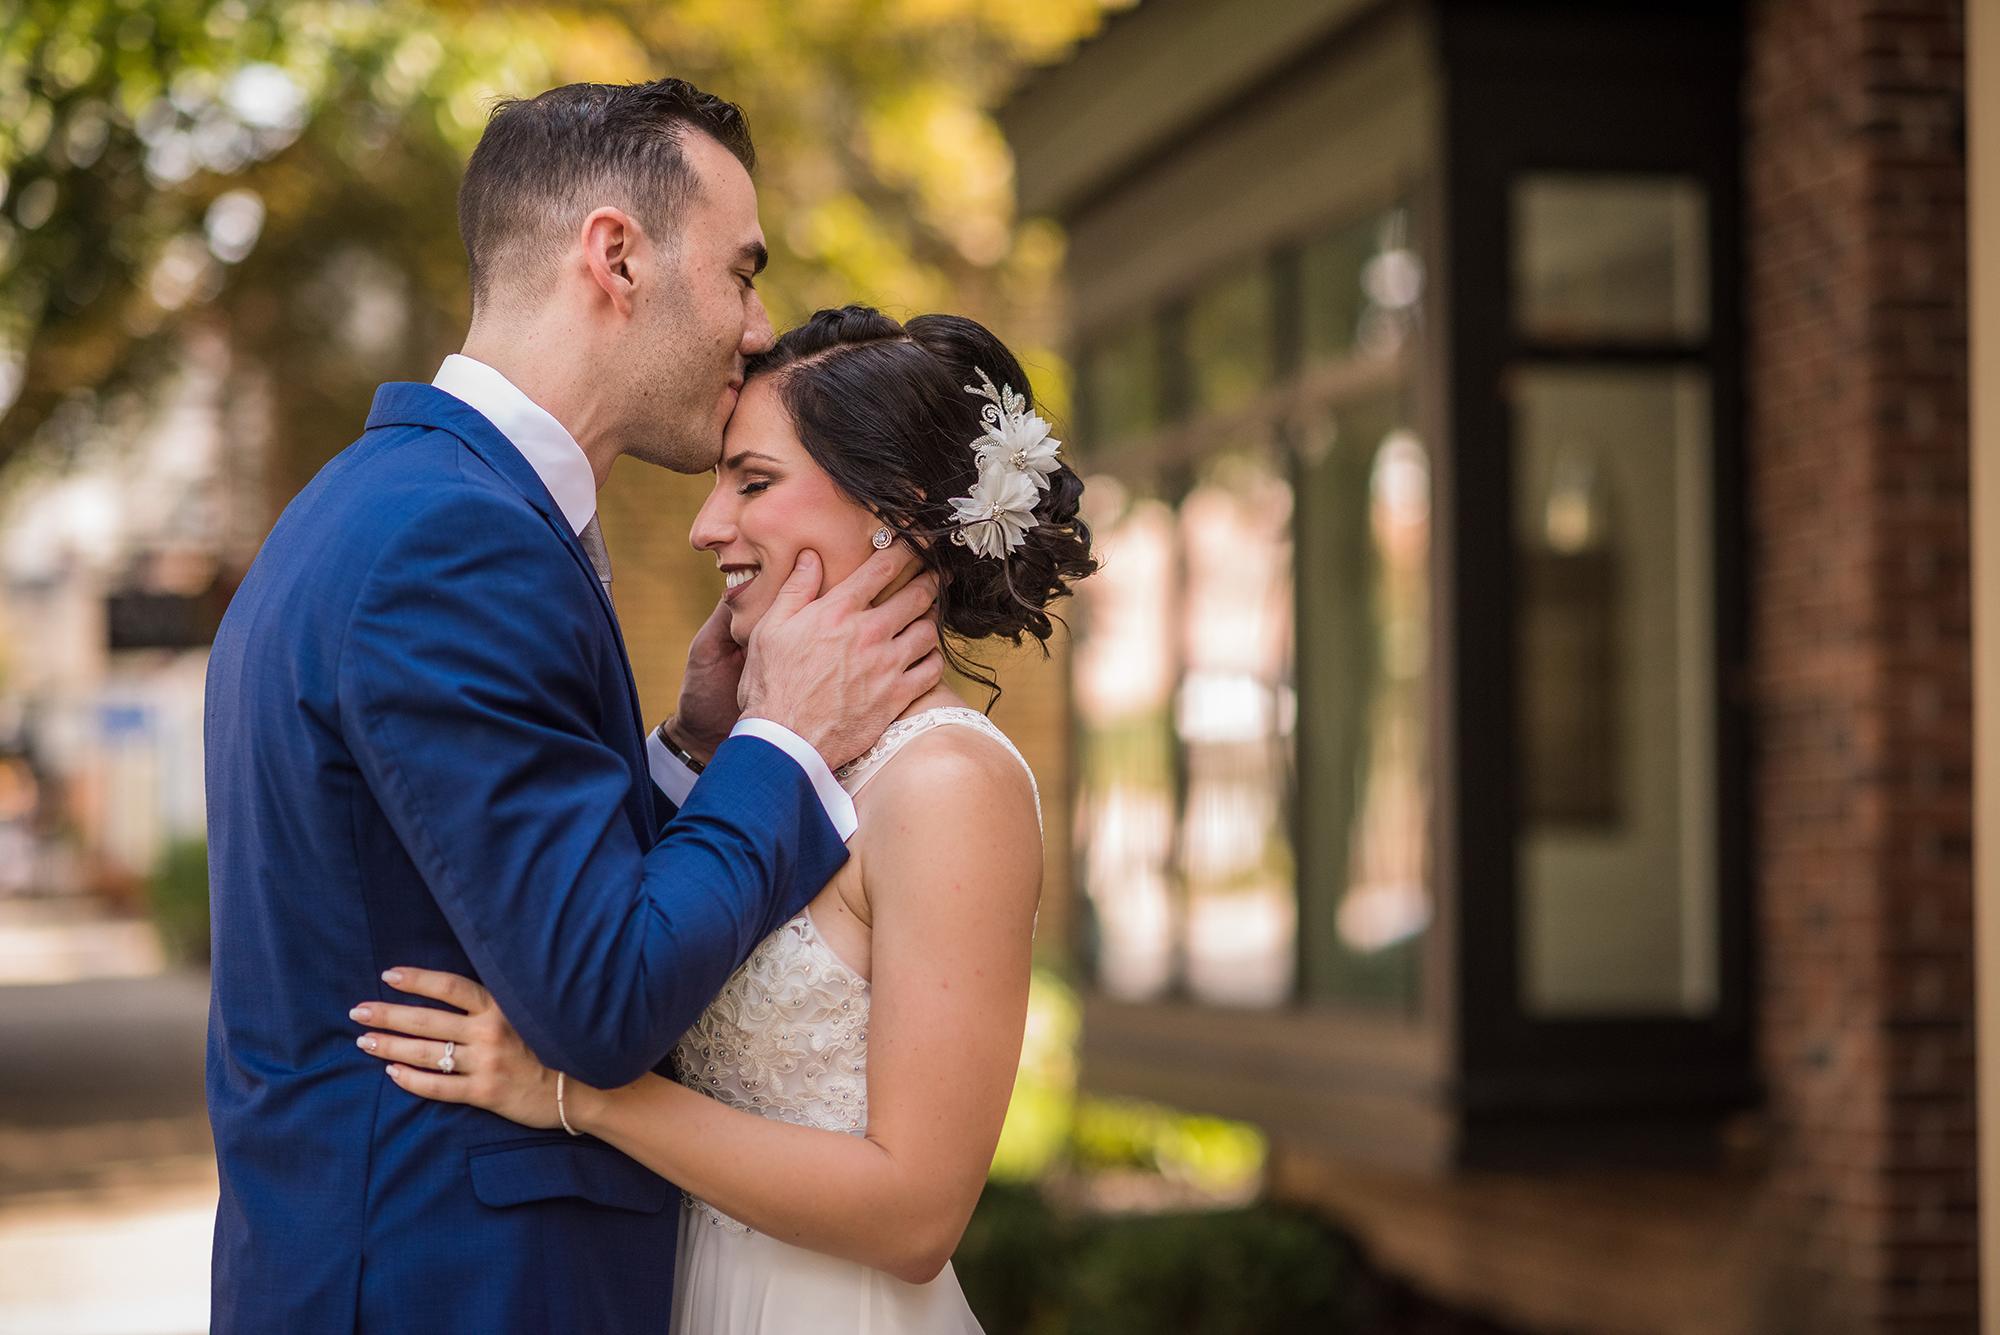 trenos-wedding-lbi-photographer-13.jpg